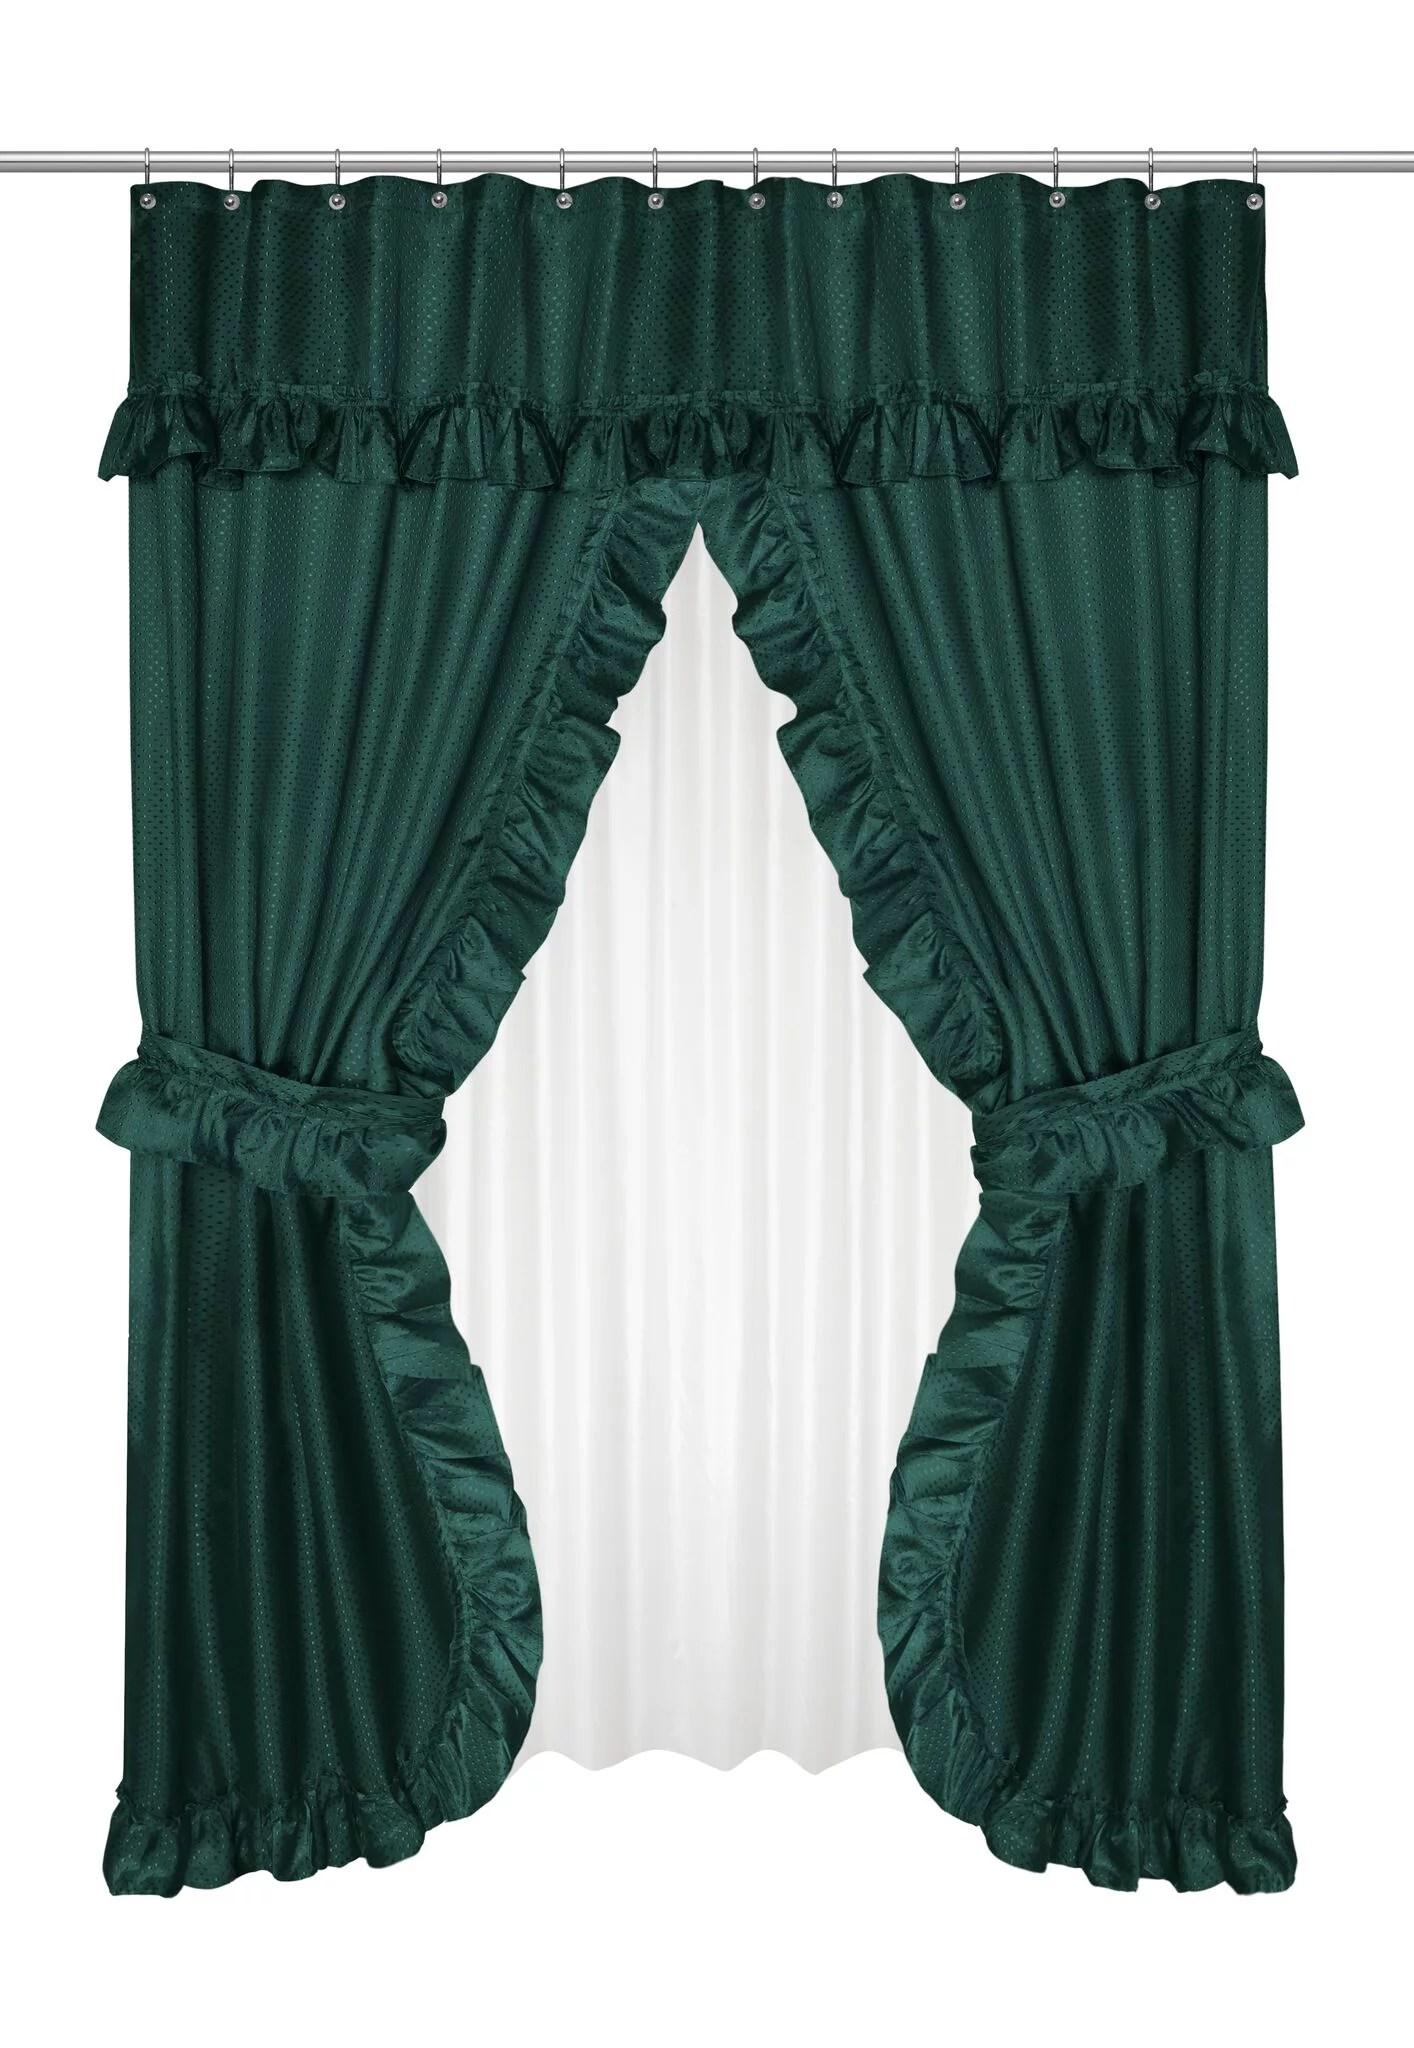 goodgram lauren complete 5 piece attached shower curtain valance set hunter green